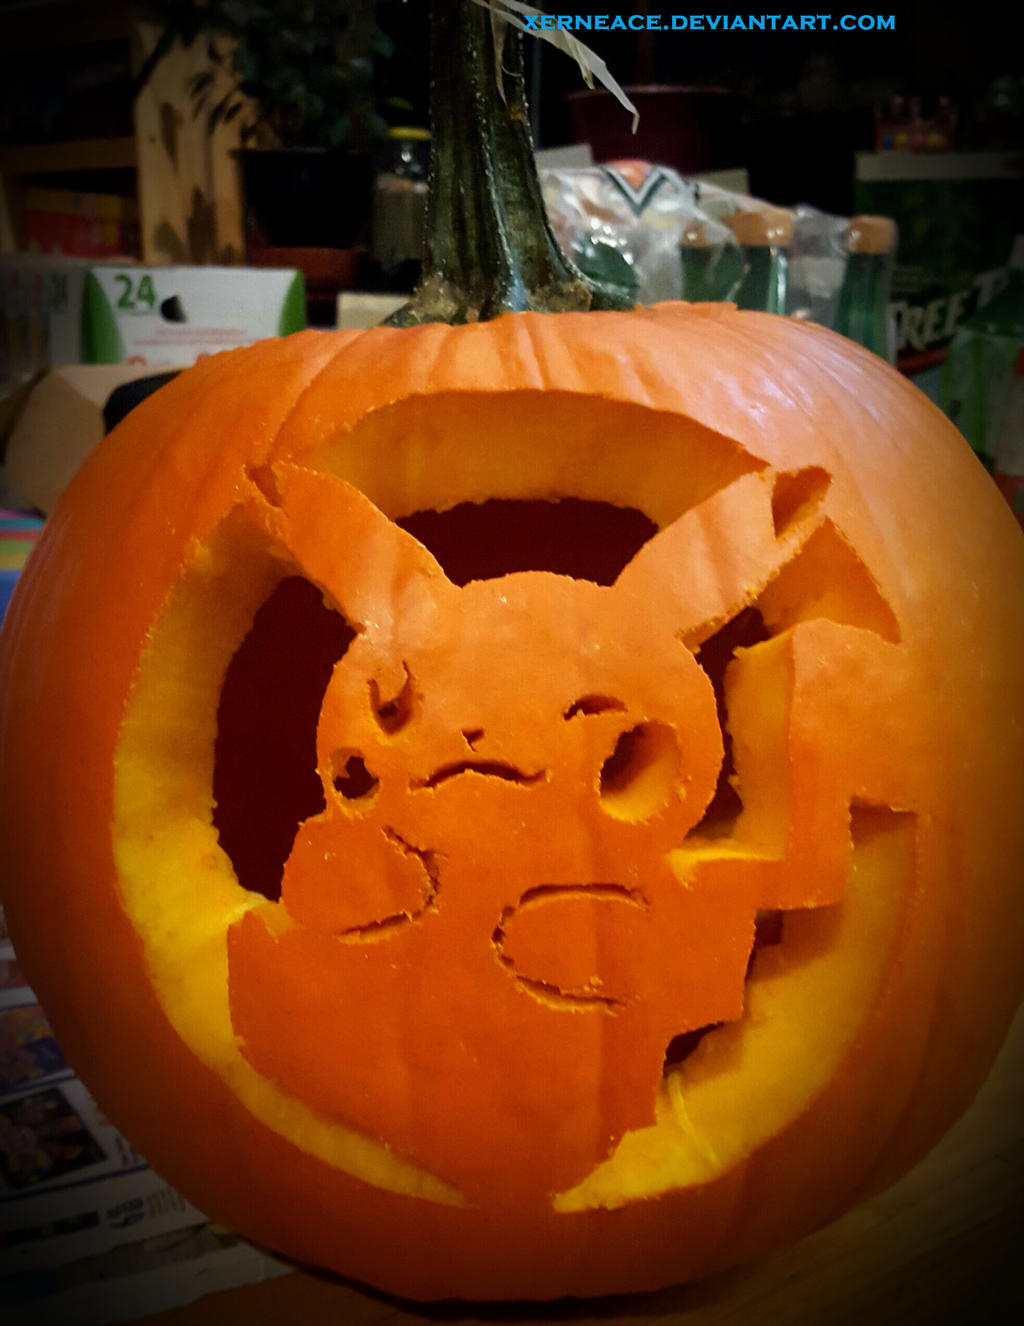 Halloween pikachu jack o lantern by xerneace on deviantart halloween pikachu jack o lantern by xerneace pronofoot35fo Gallery